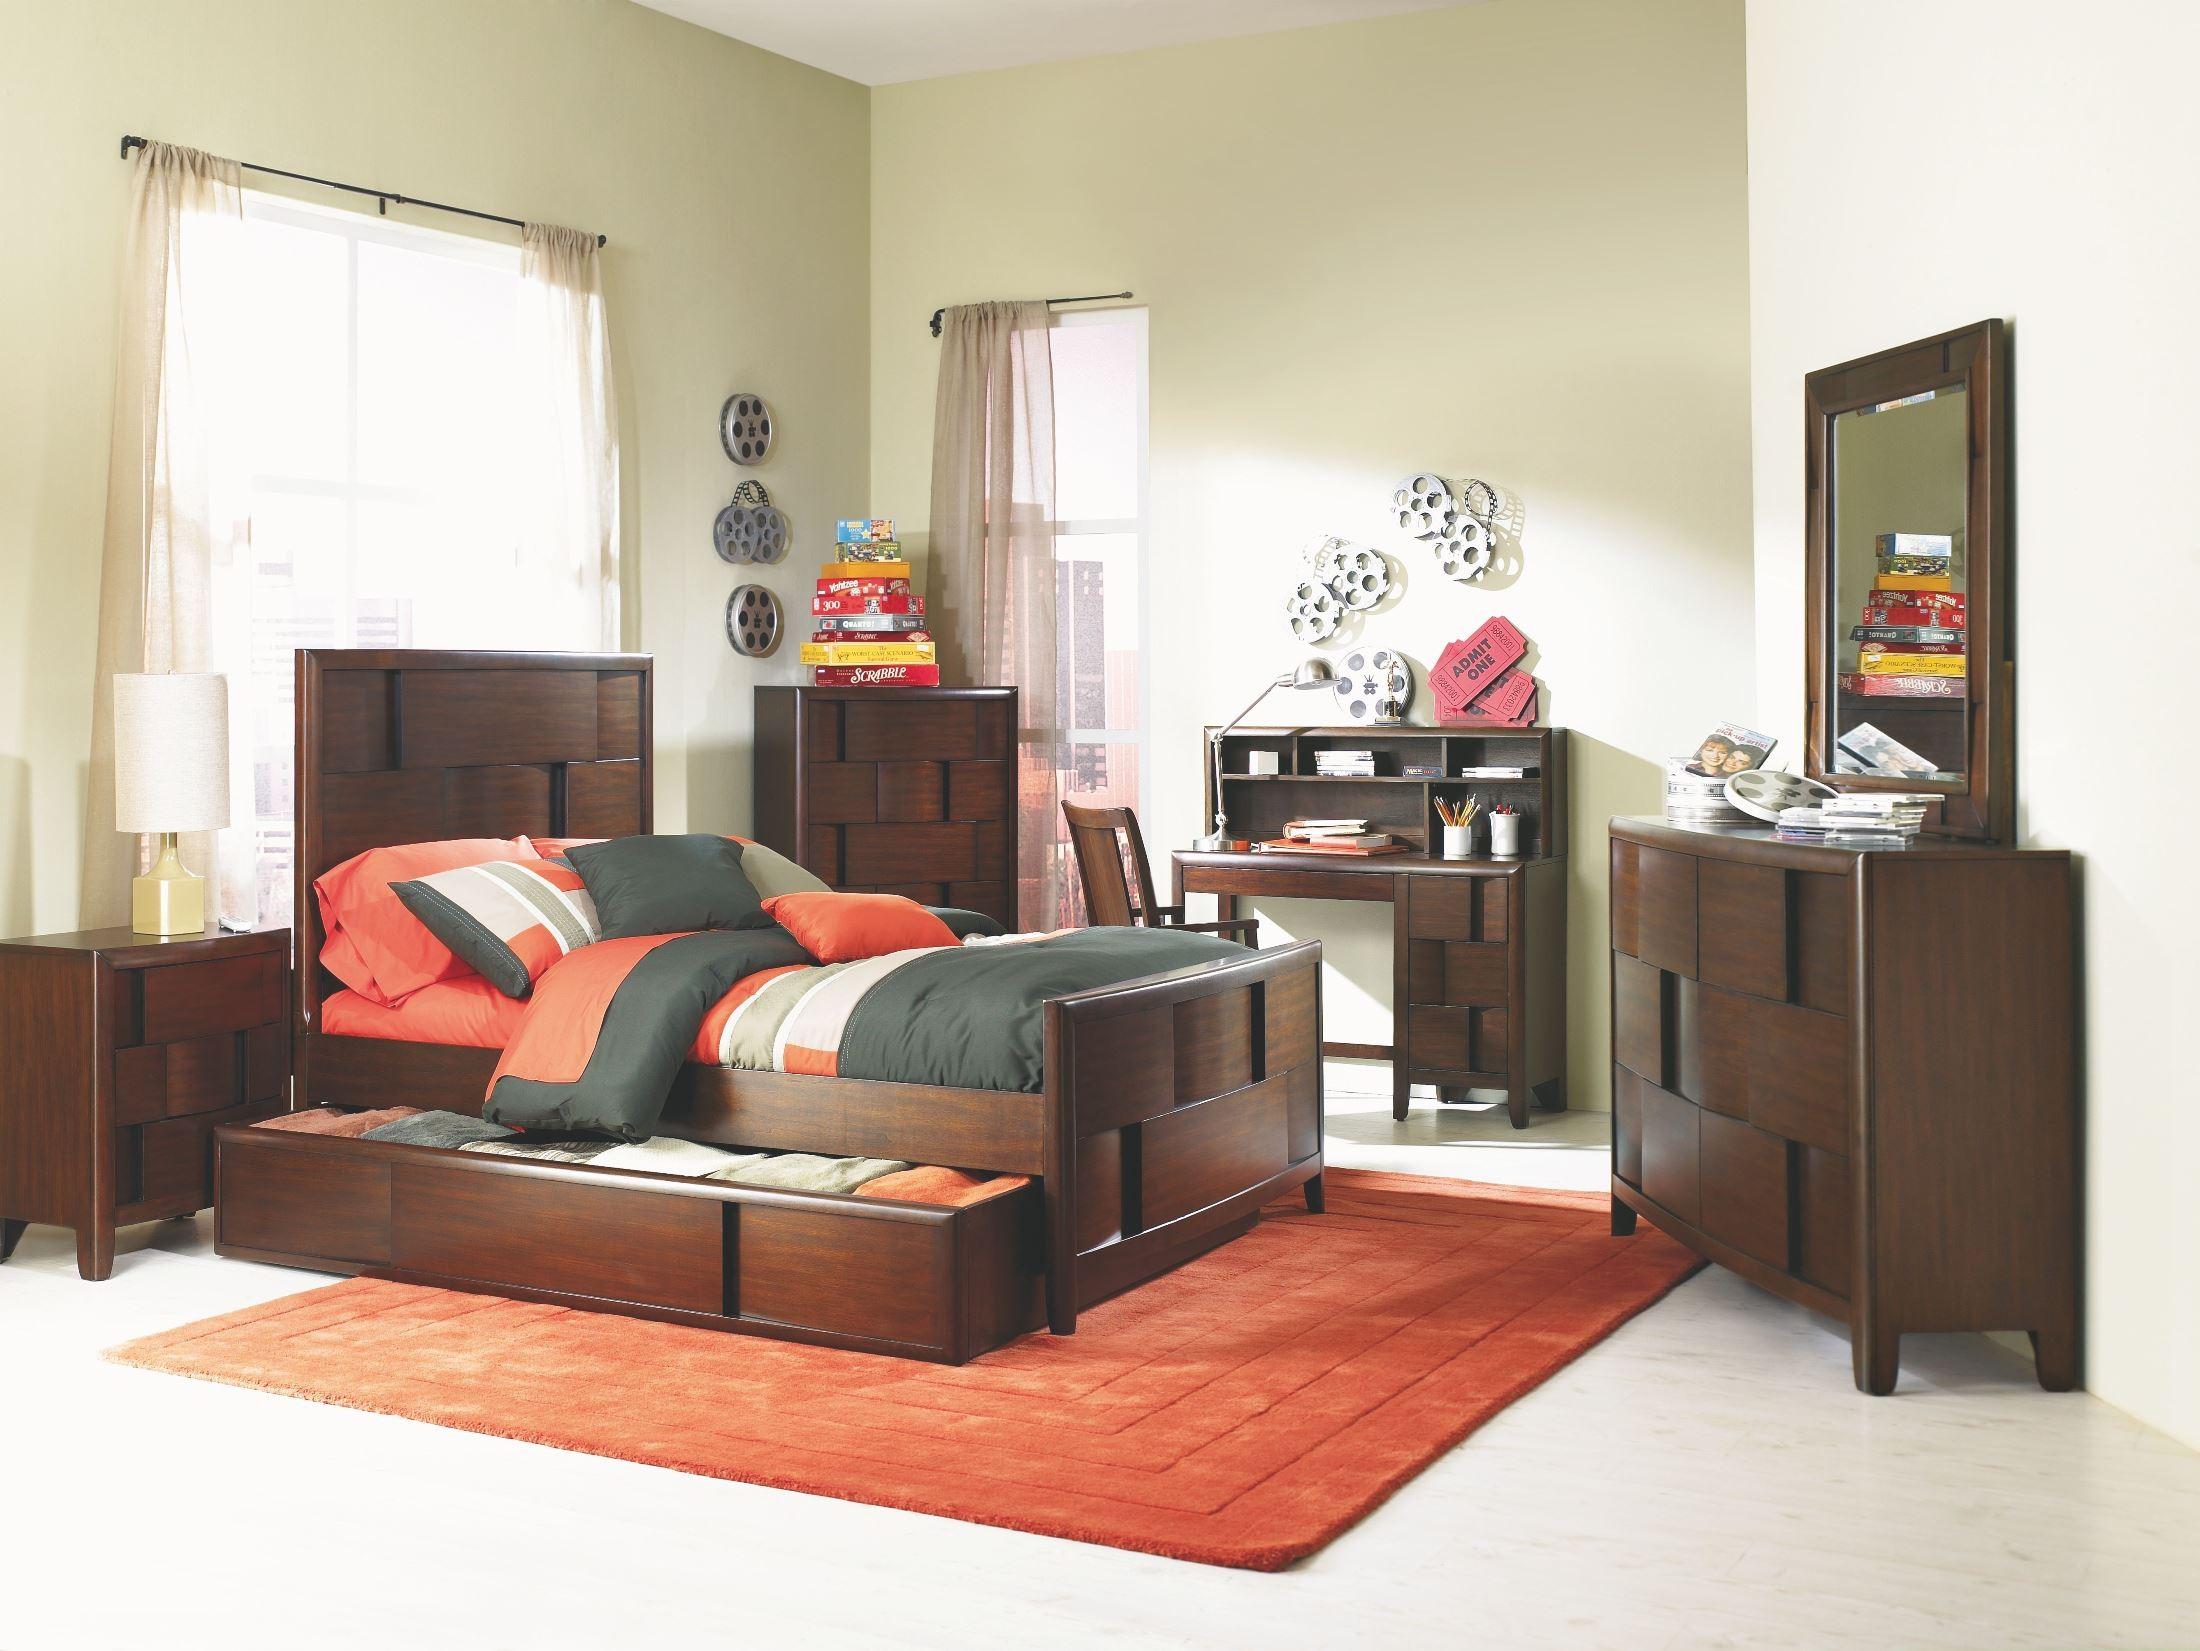 Twilight Trundle Panel Bedroom Set From Magnussen Home